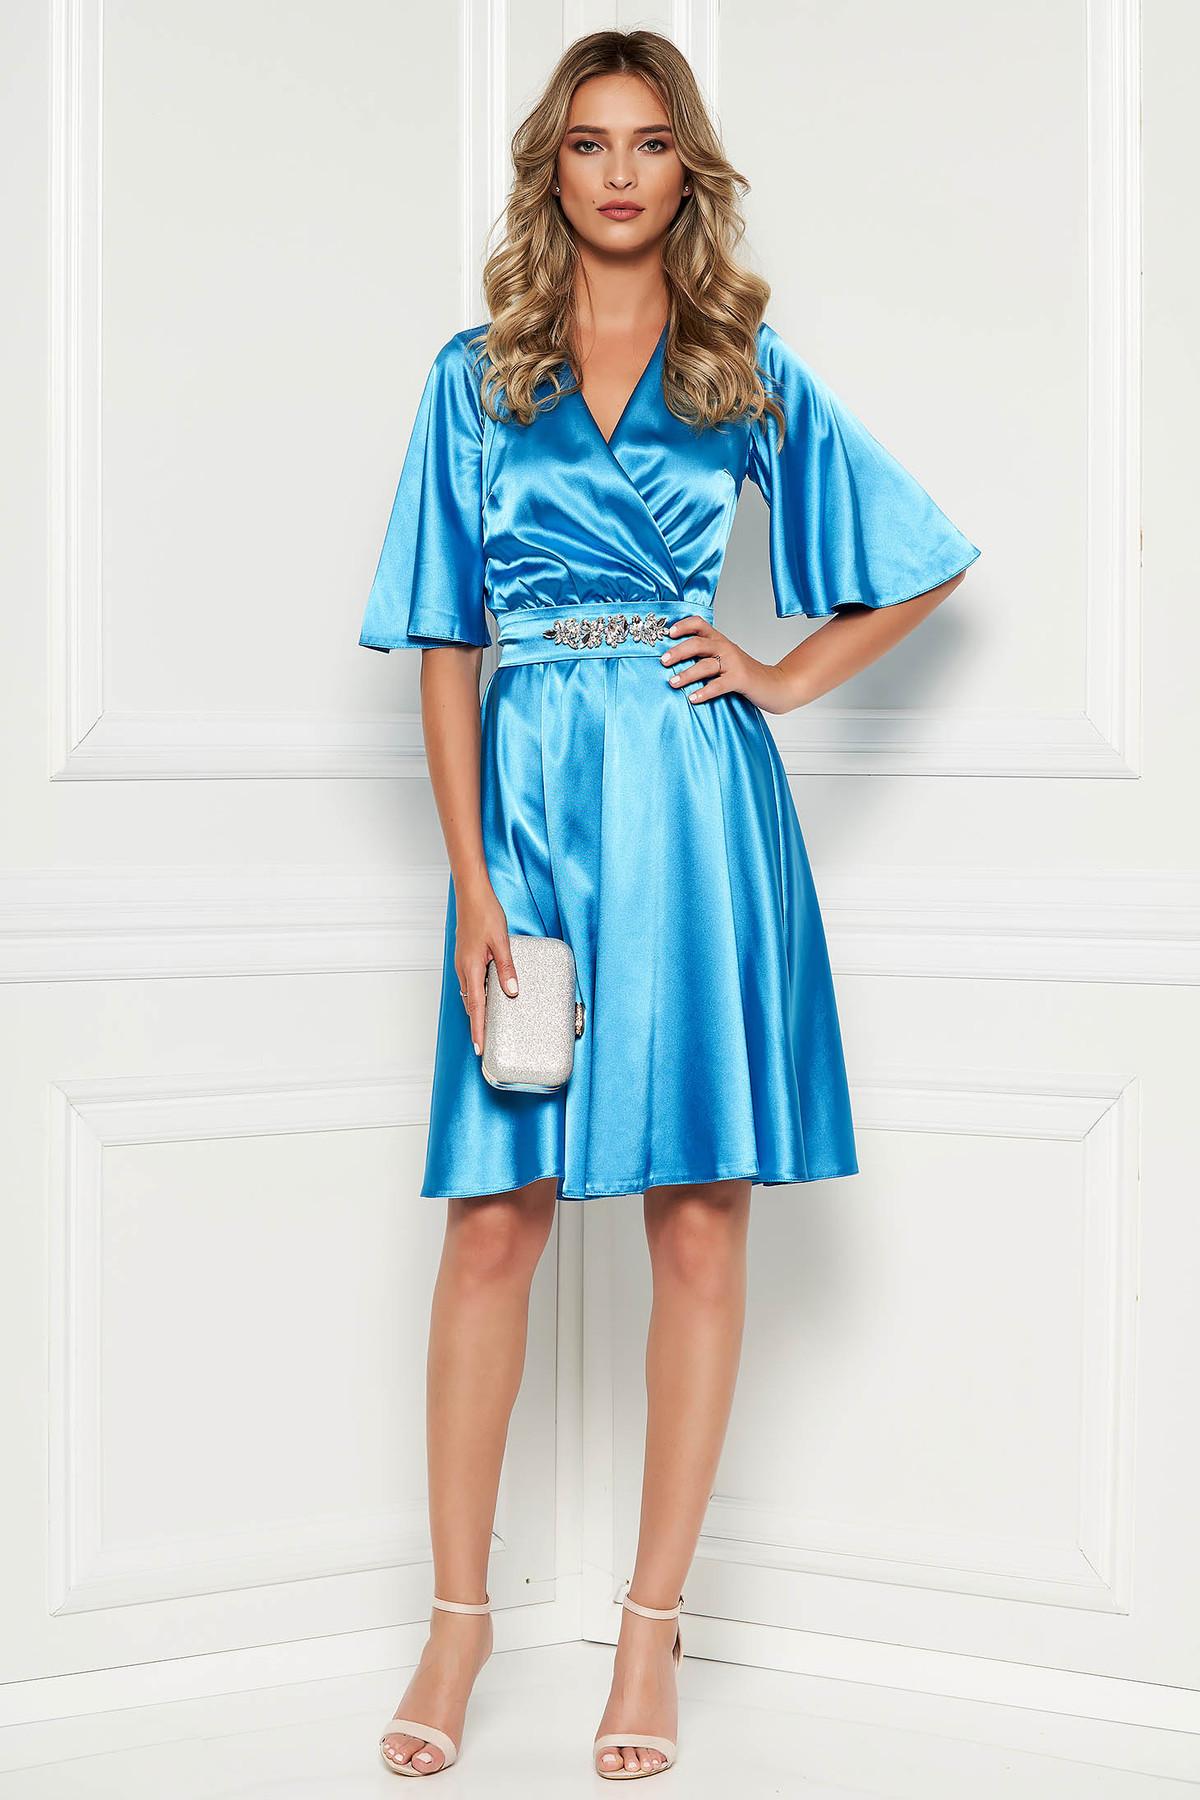 Rochie StarShinerS albastra de ocazie din material satinat captusita pe interior accesorizata cu cordon accesorizata cu pietre stras